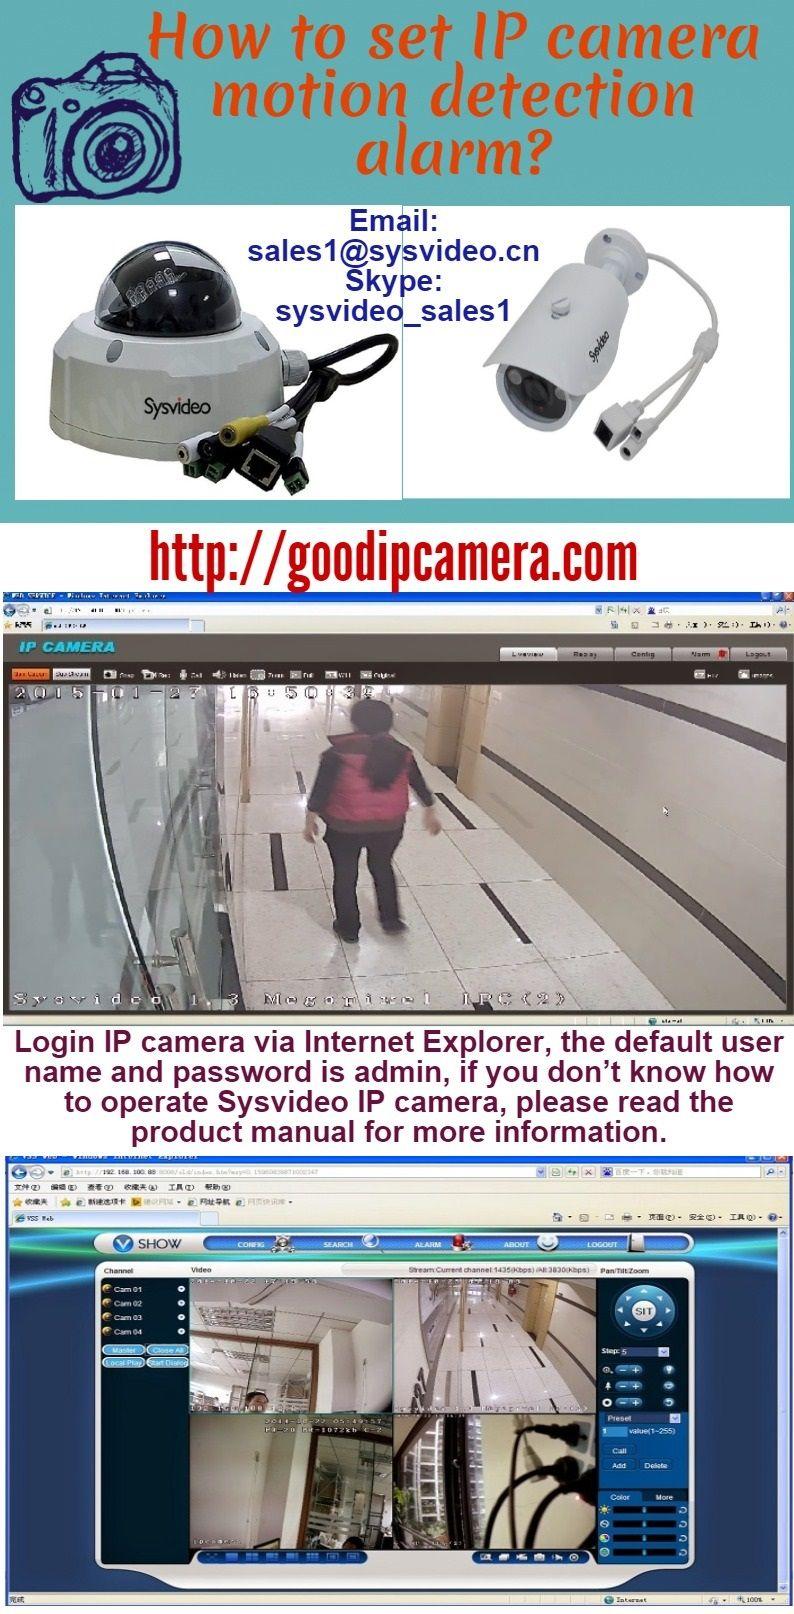 Pin by goodipcamera on China's IP Camera & NVR Manufacturer | IP